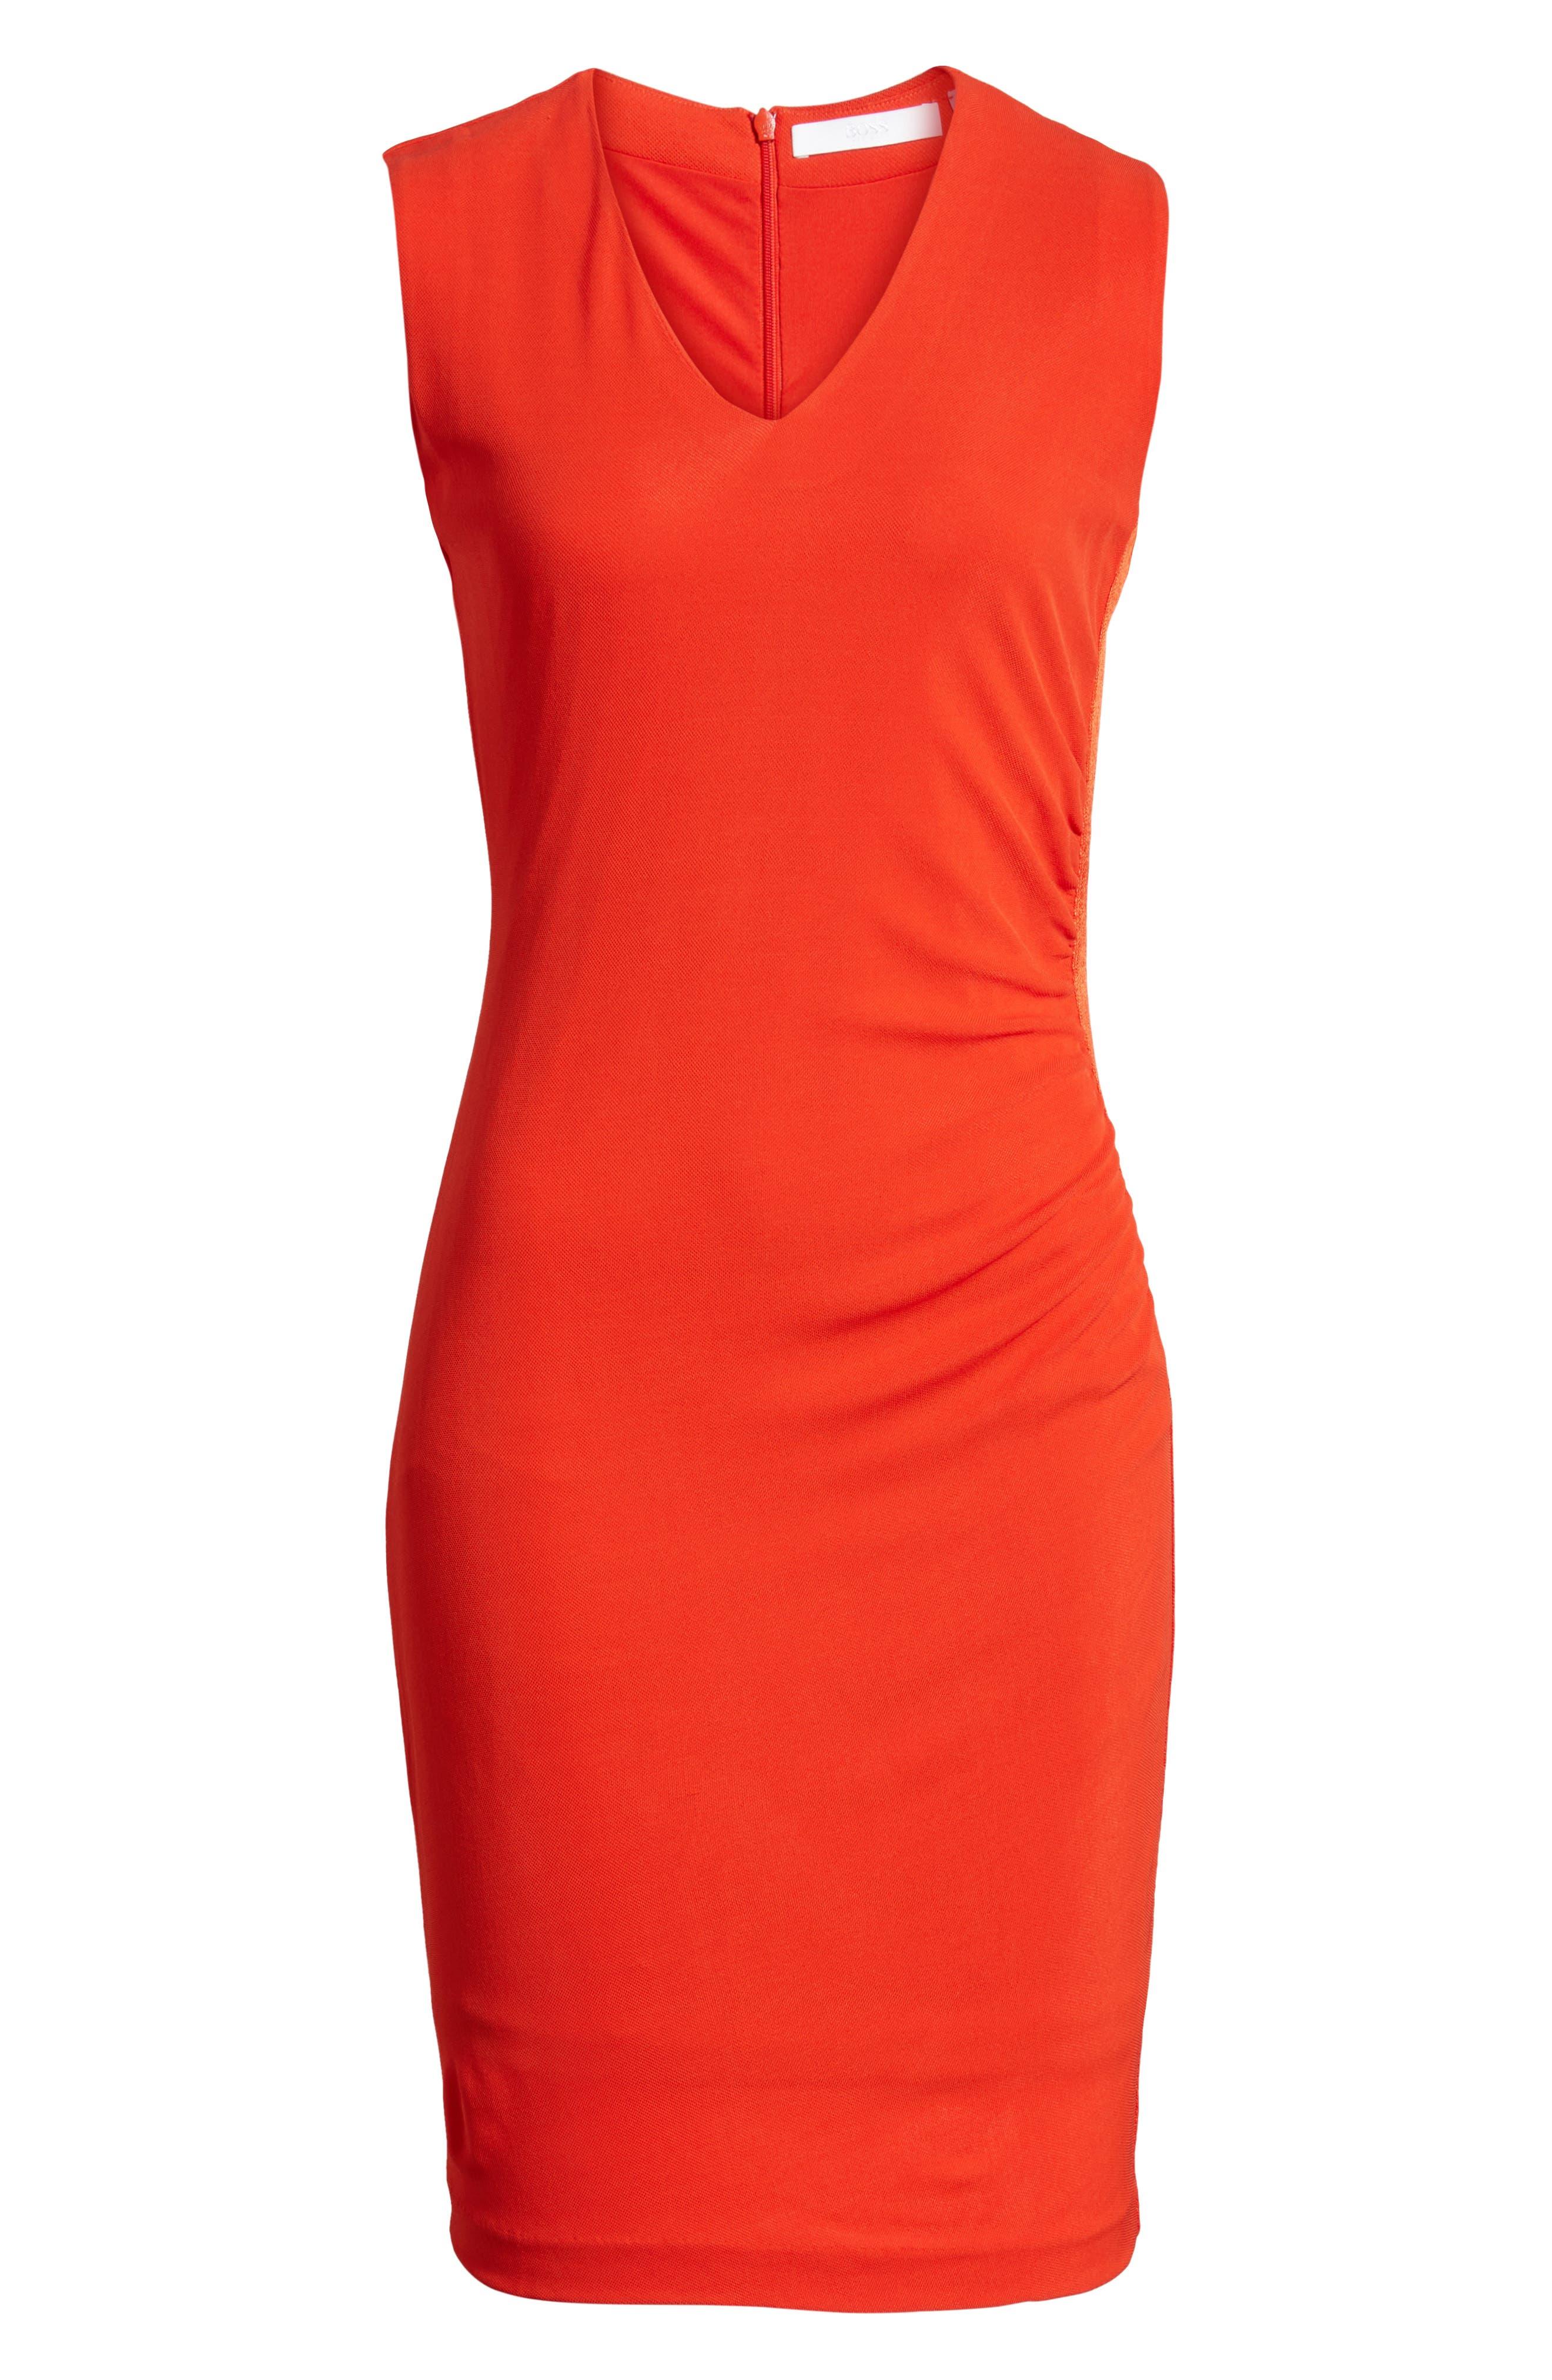 Erela Ruched Sheath Dress,                             Alternate thumbnail 7, color,                             824